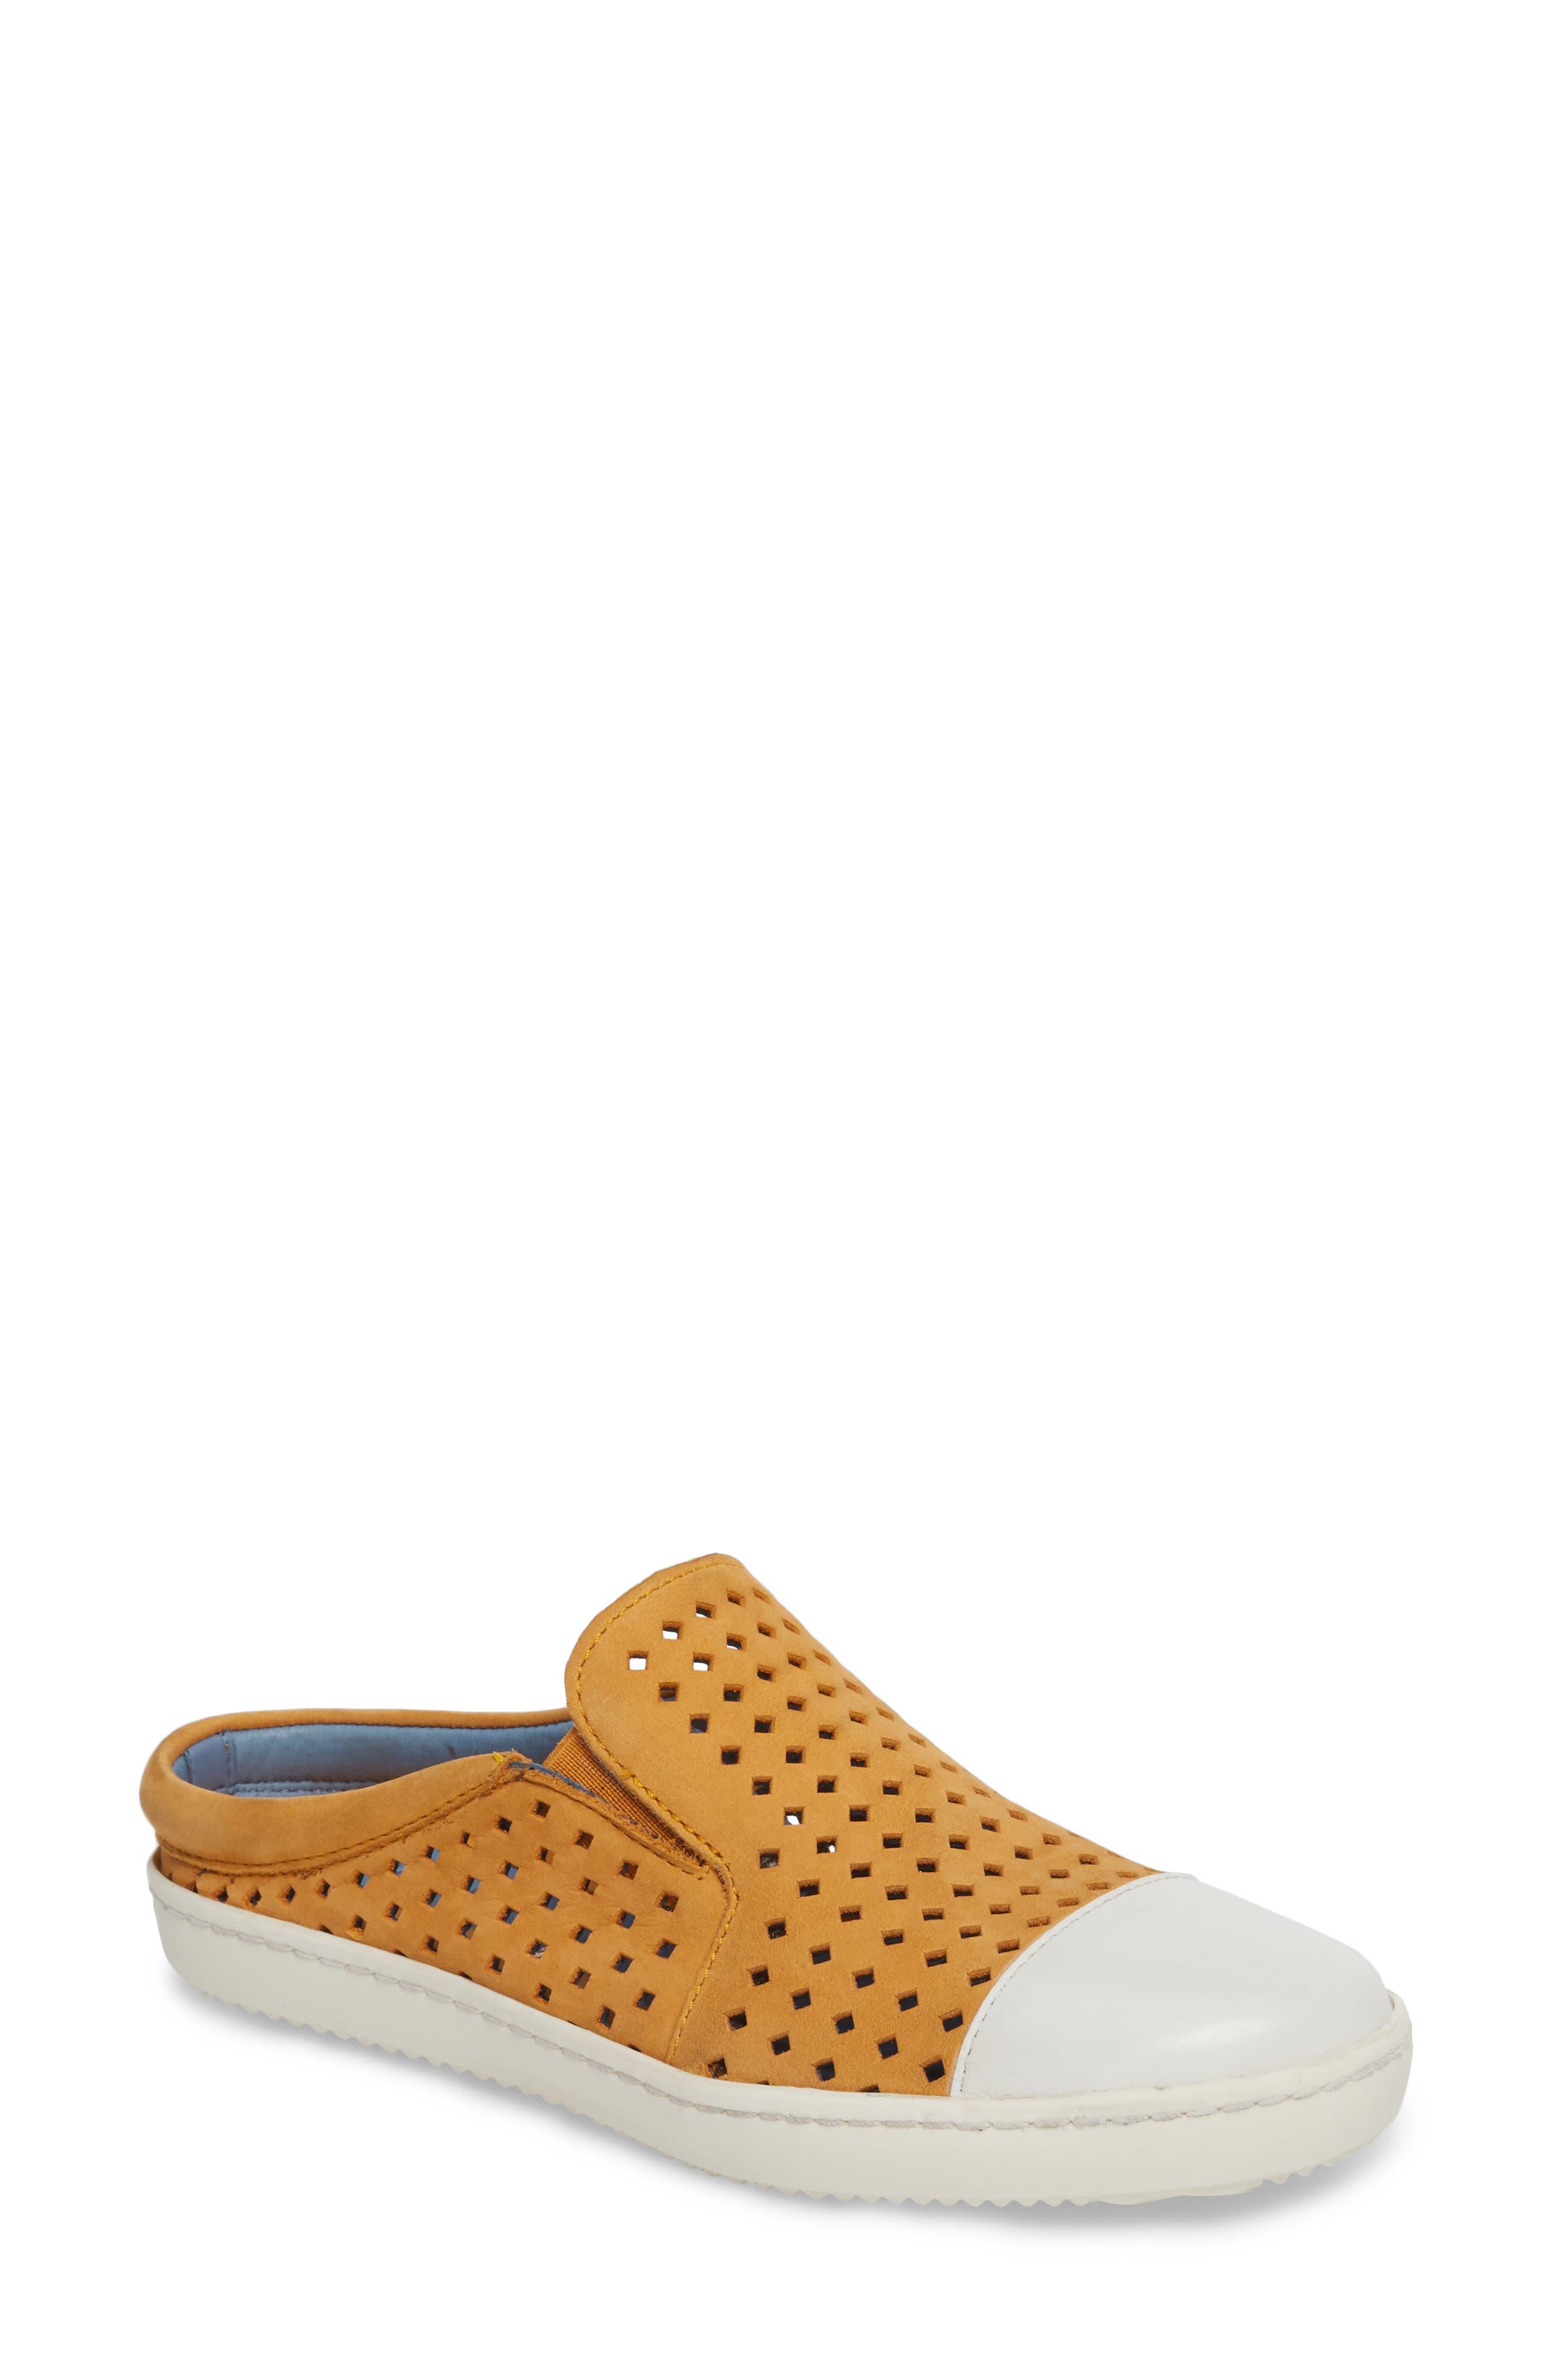 Tippy Slip-On Sneaker,                         Main,                         color, Saffon Suede